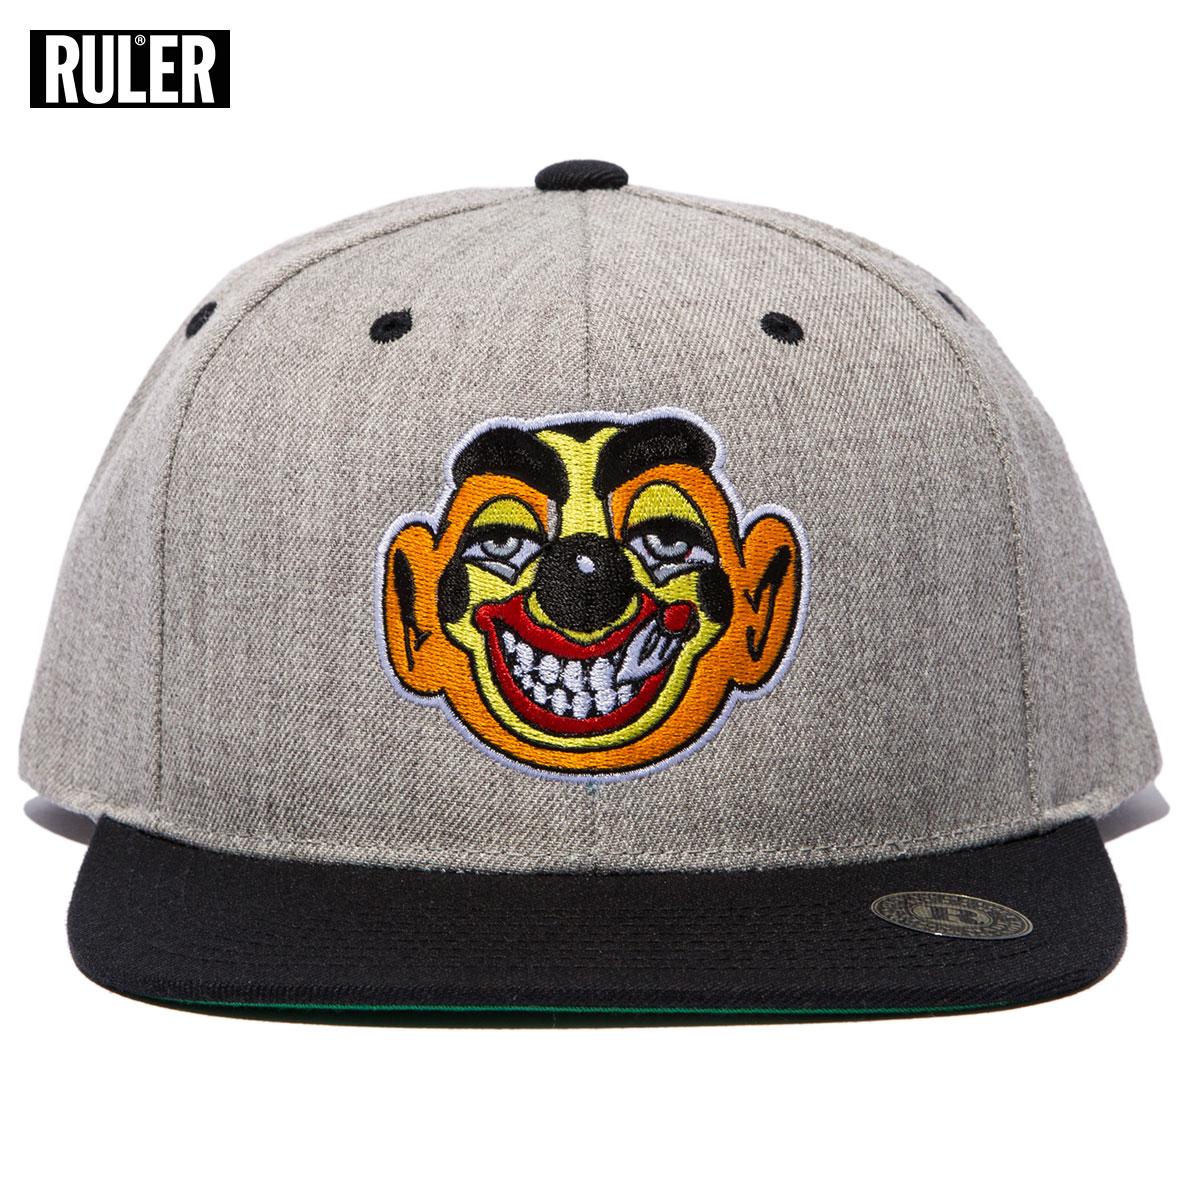 Super SALE 10% off RULER (rulers) HERBS CLOWN SBC [sale] [Cap snap back Hat mens CHEECH & CHONG Cheech & Chong Chih-chiang] Rakuten card Division